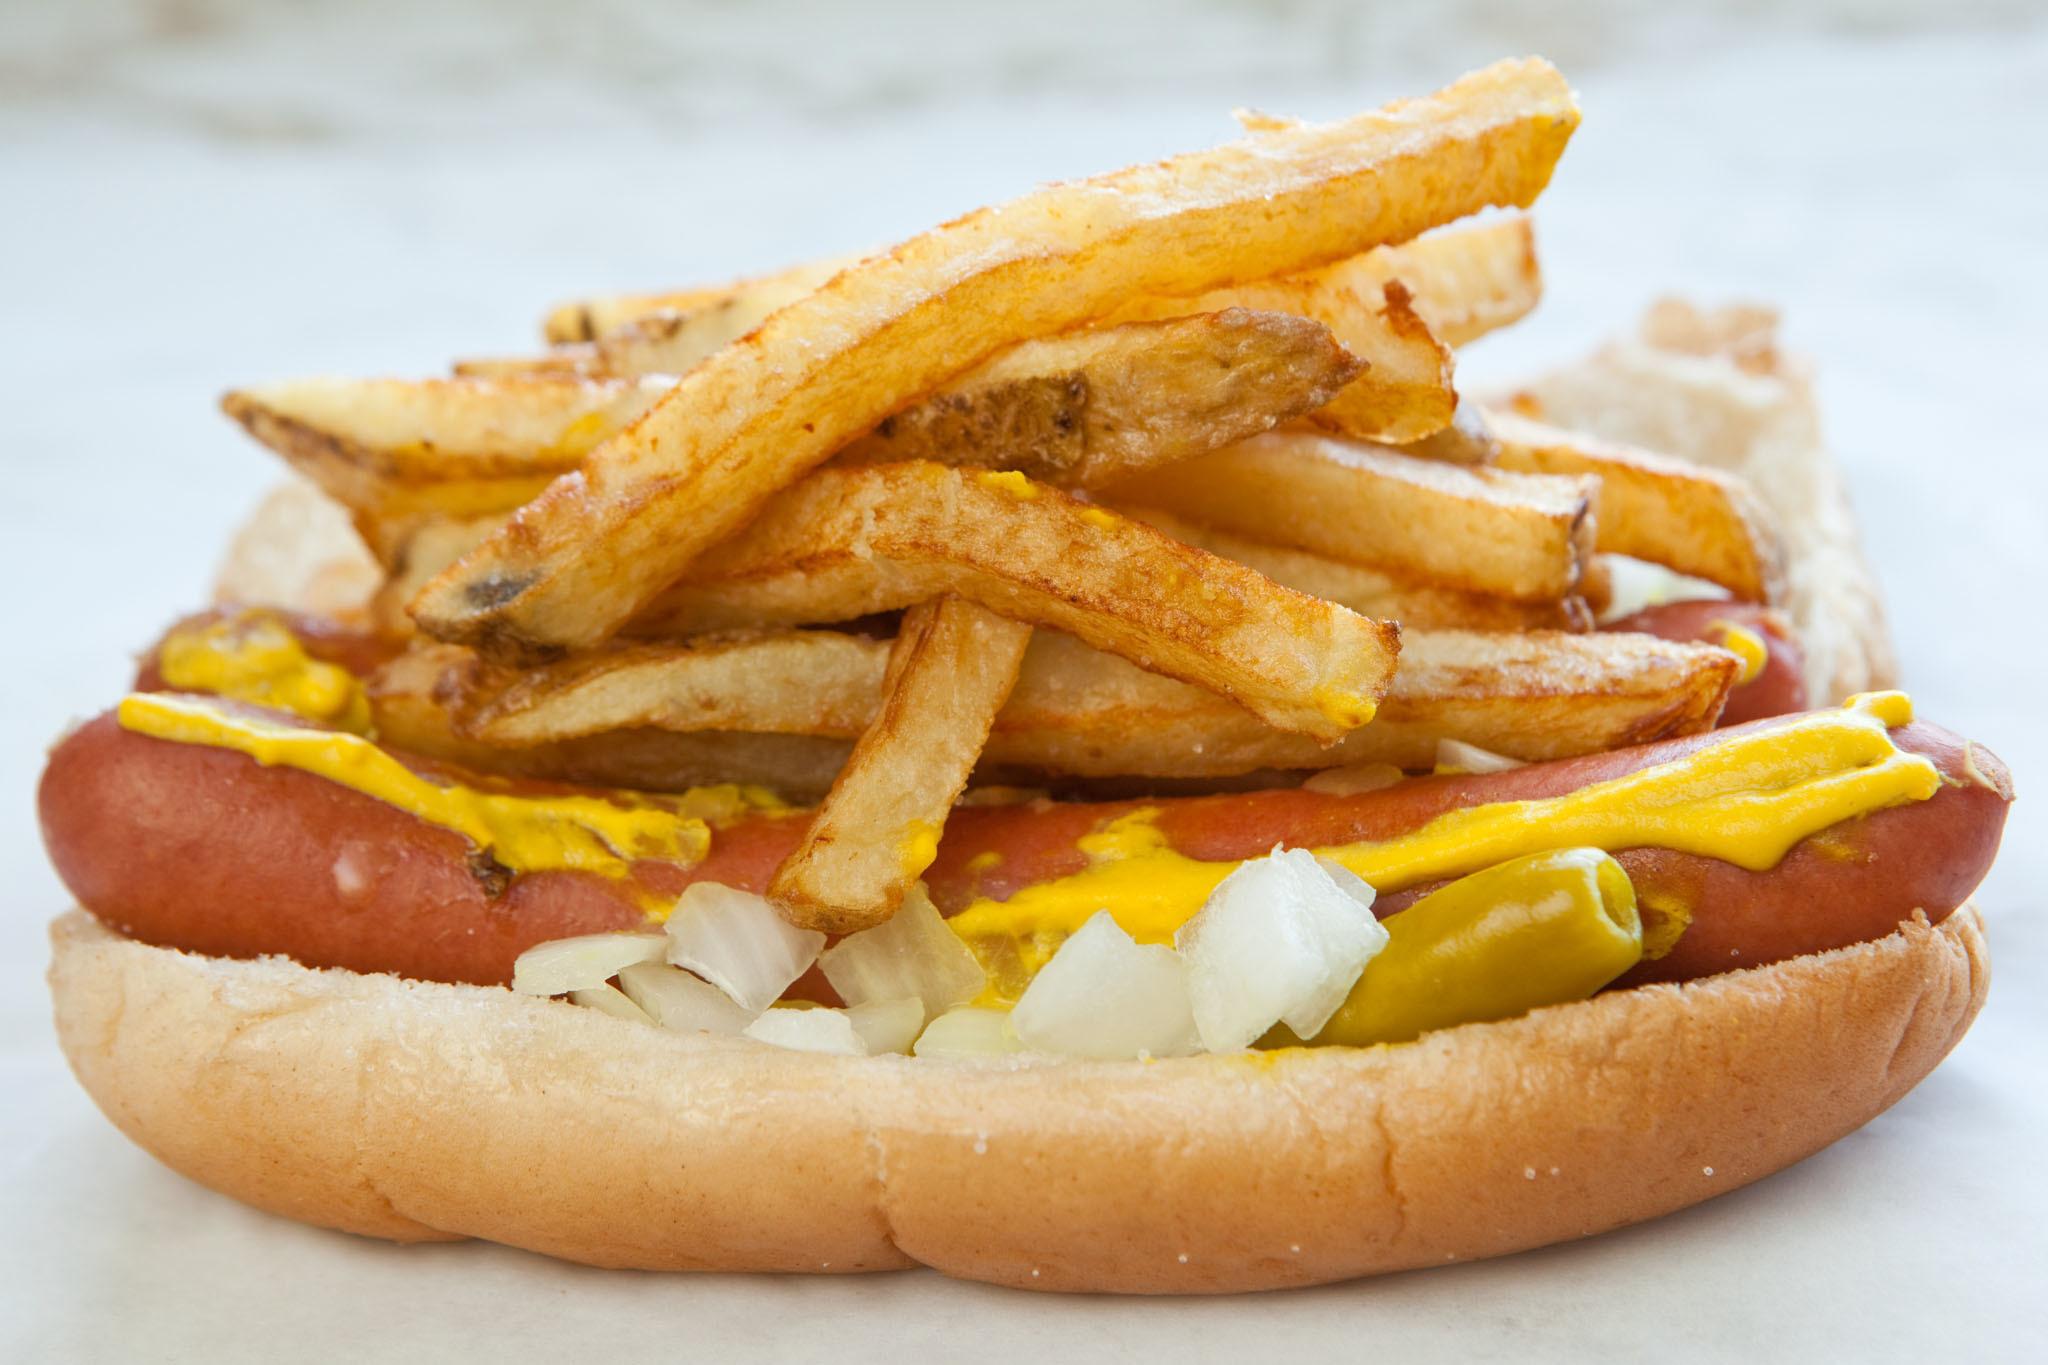 Floor Six Iconic Stands That Hot Vegan Ago Style Hot Dog Recipe Ago Hot Dog Bun Recipe nice food Chicago Hot Dog Recipe